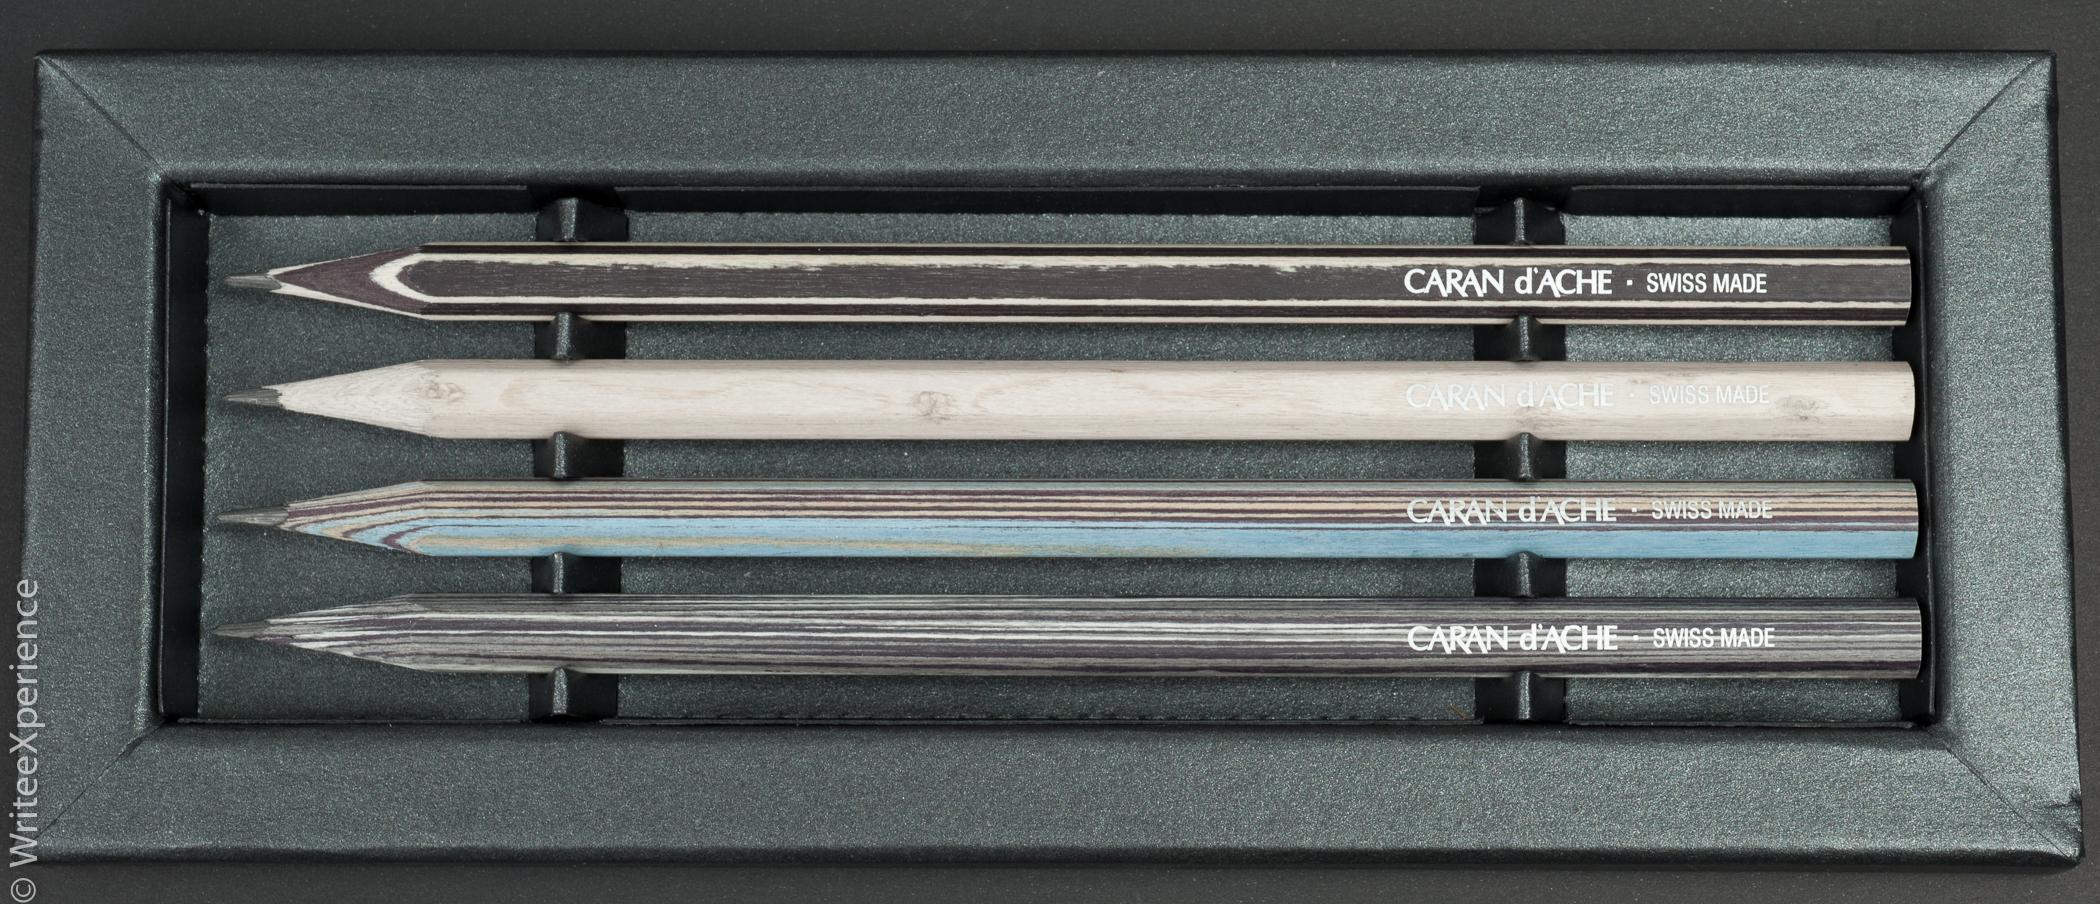 WriteeXperience-Caran-dache-noblewood-pencils-5th-8.jpg